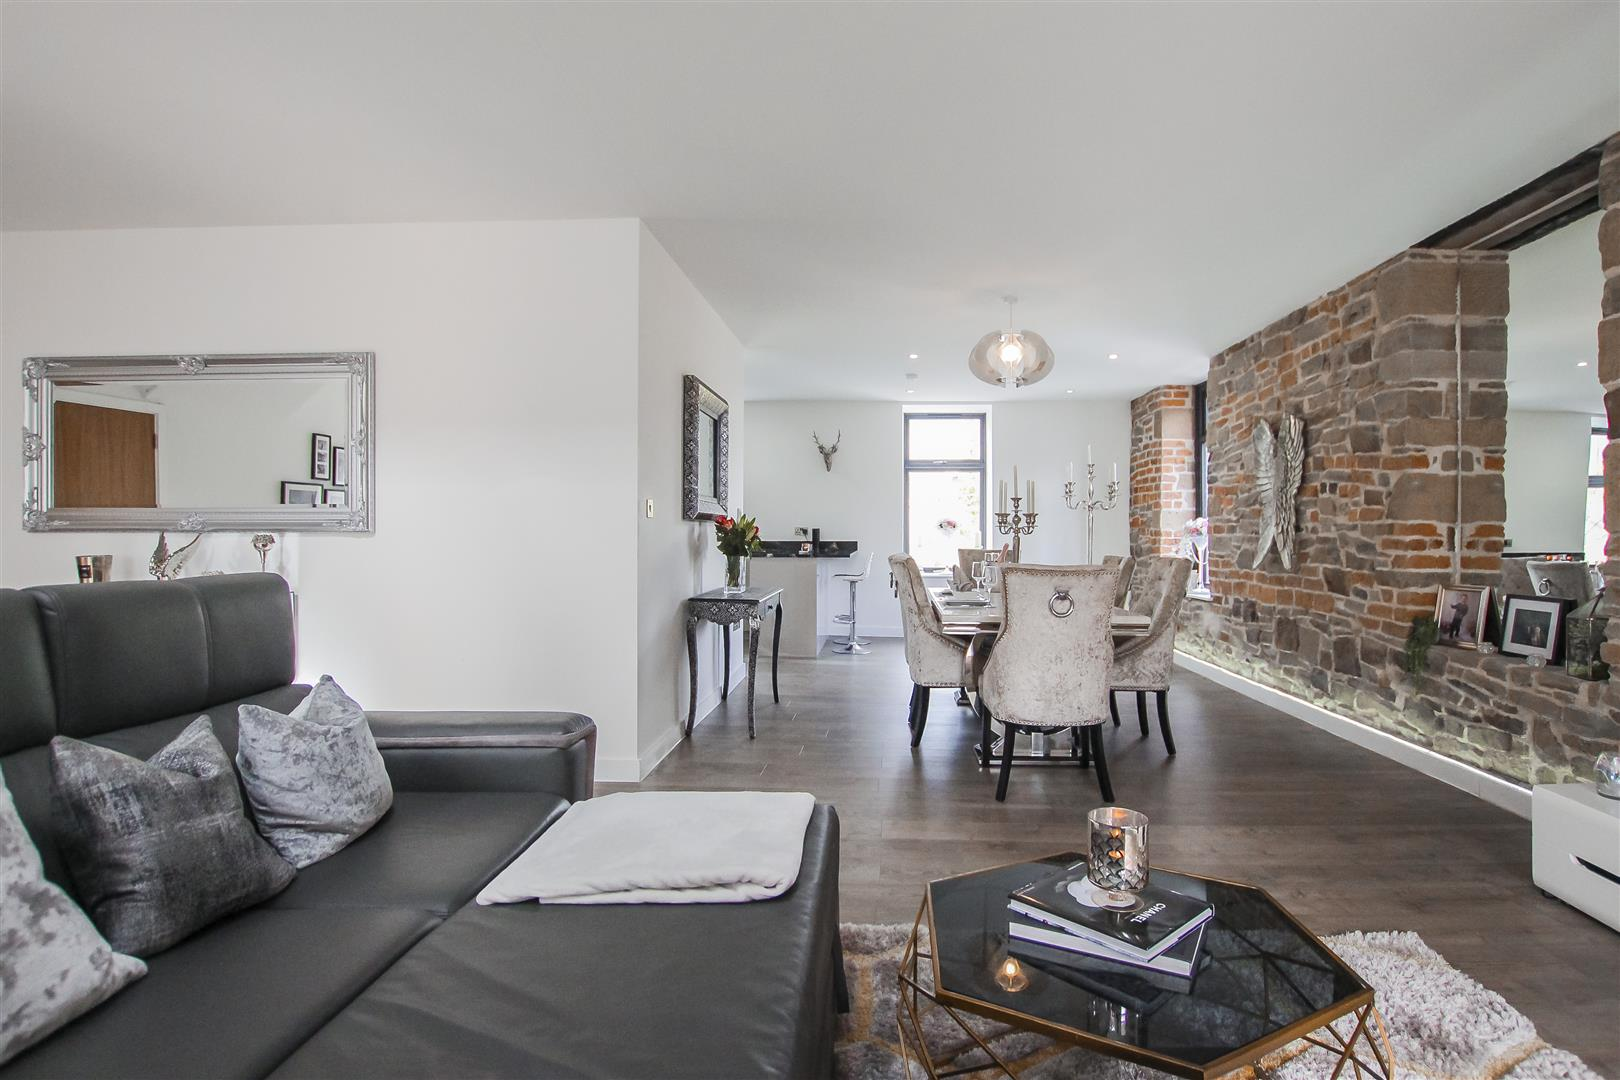 3 Bedroom Duplex Apartment For Sale - Image 33